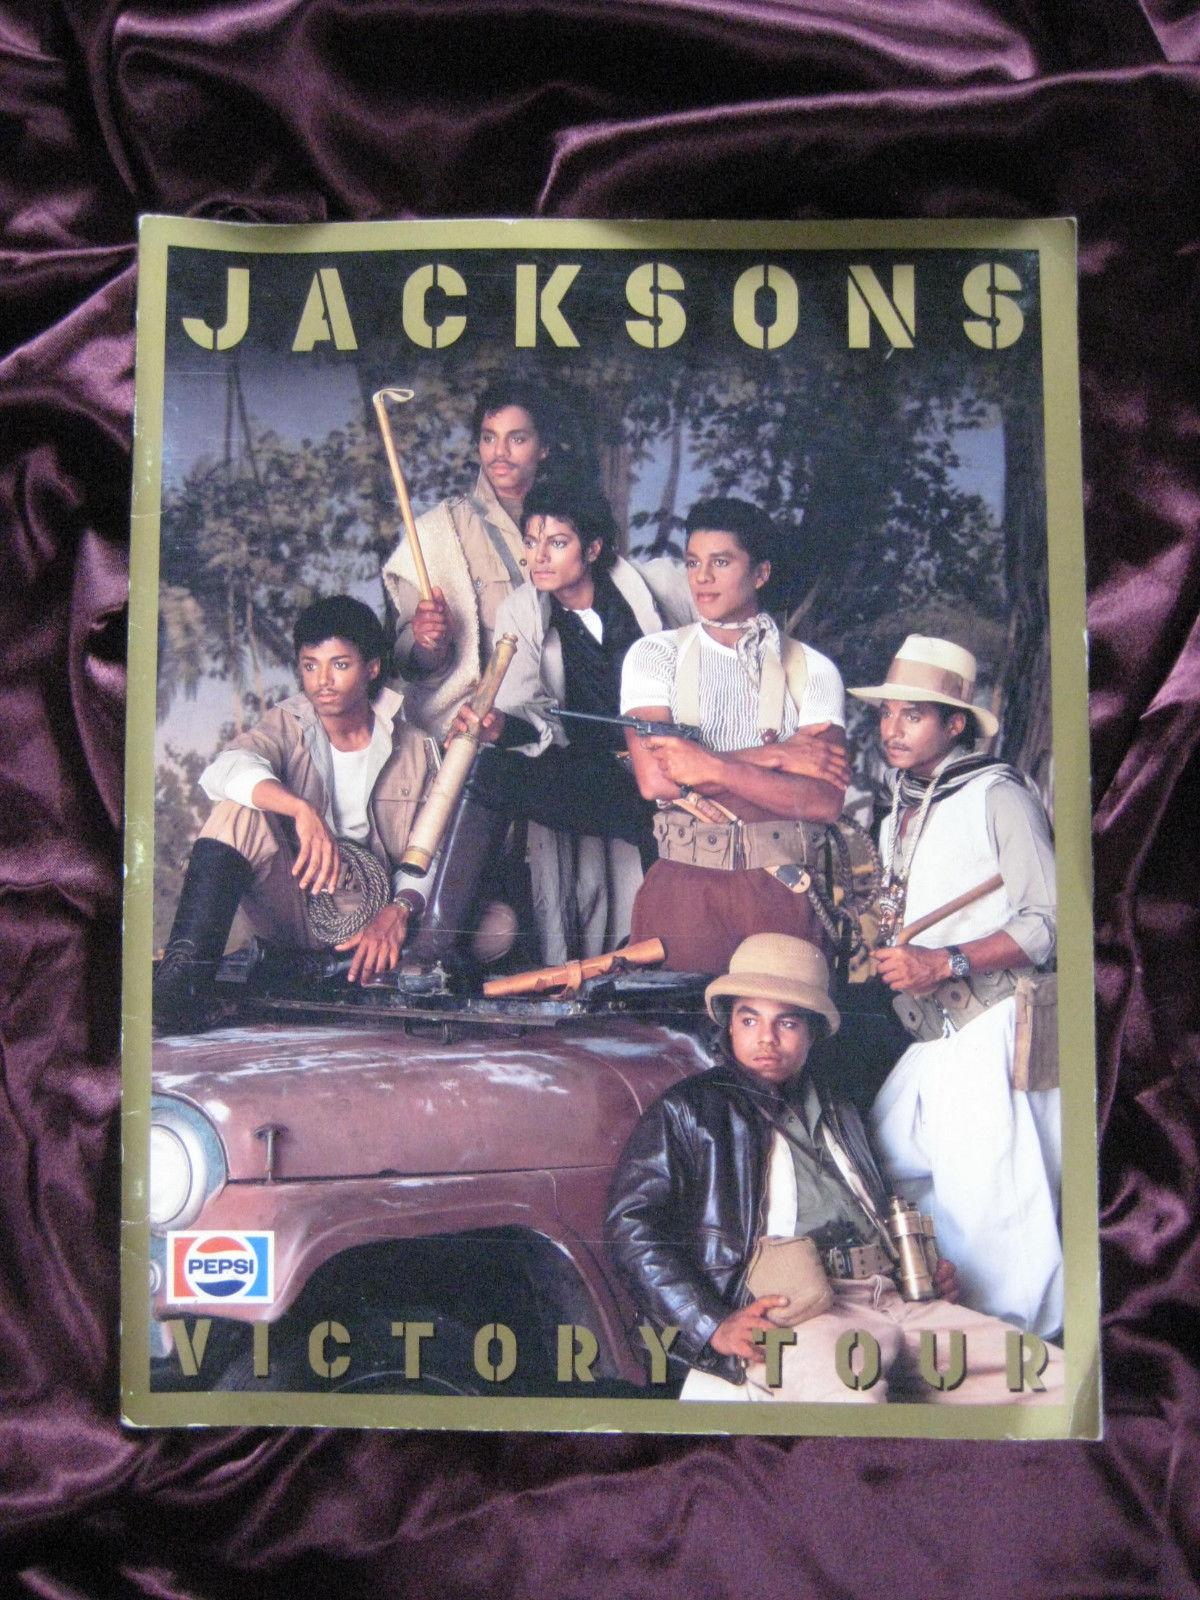 A Vintage Victory Tour संगीत कार्यक्रम Program